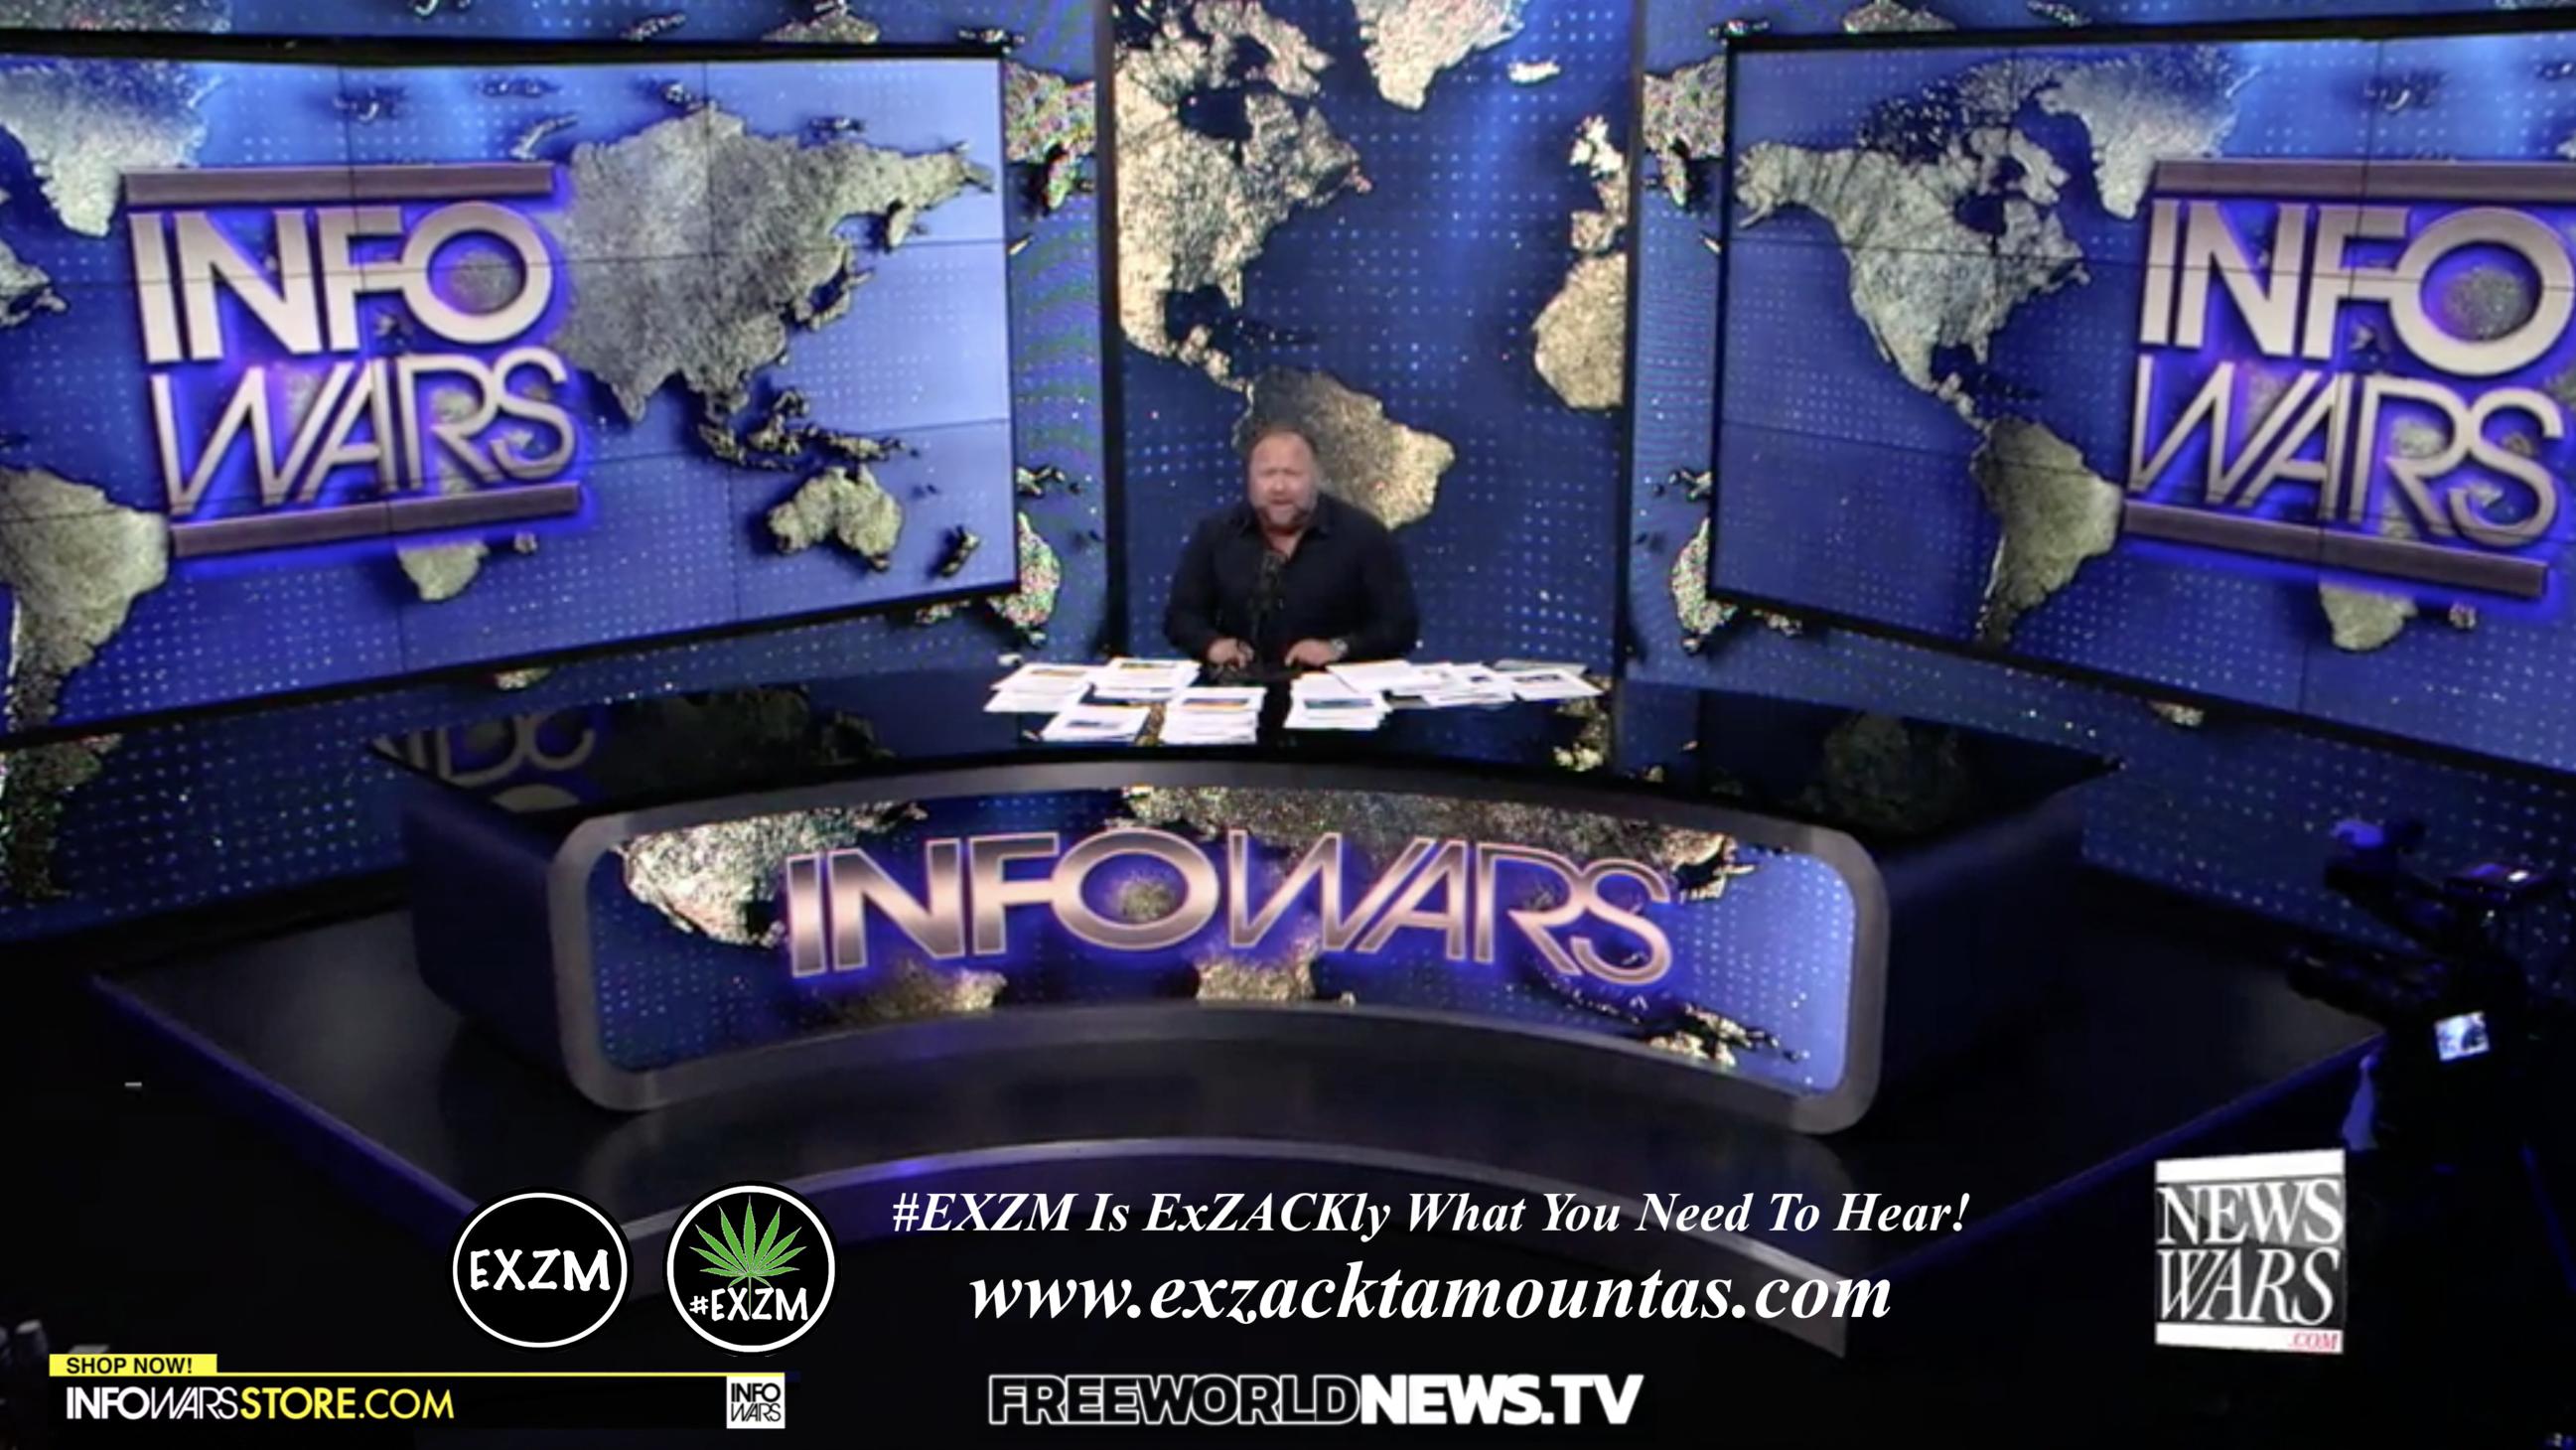 Alex Jones Live In Infowars Studio Free World News TV EXZM Zack Mount August 12th 2021 copy